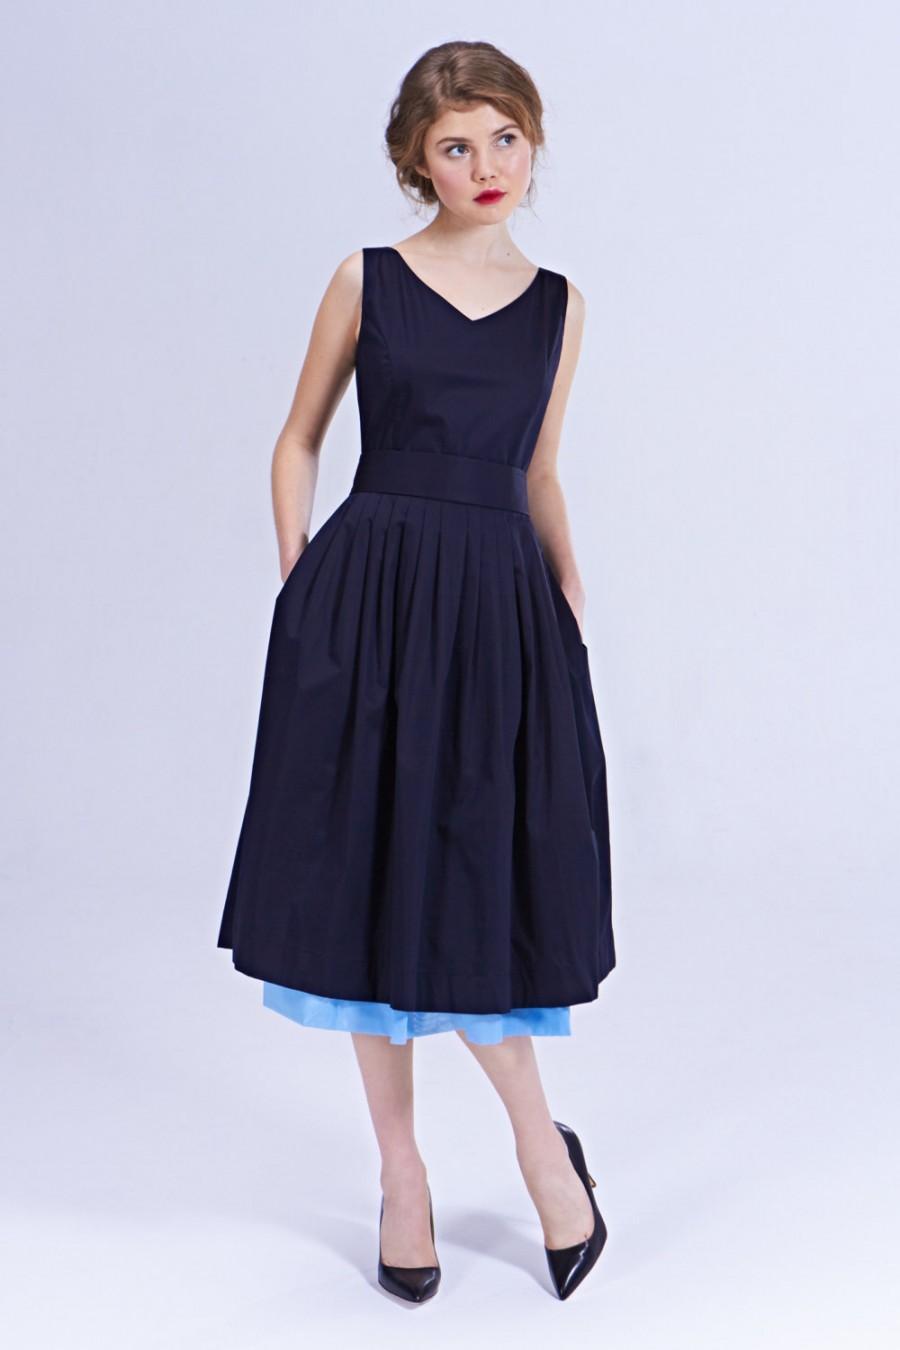 Navy Bridesmaid Dress Navy V Neck Dress Bridesmaid Dresses